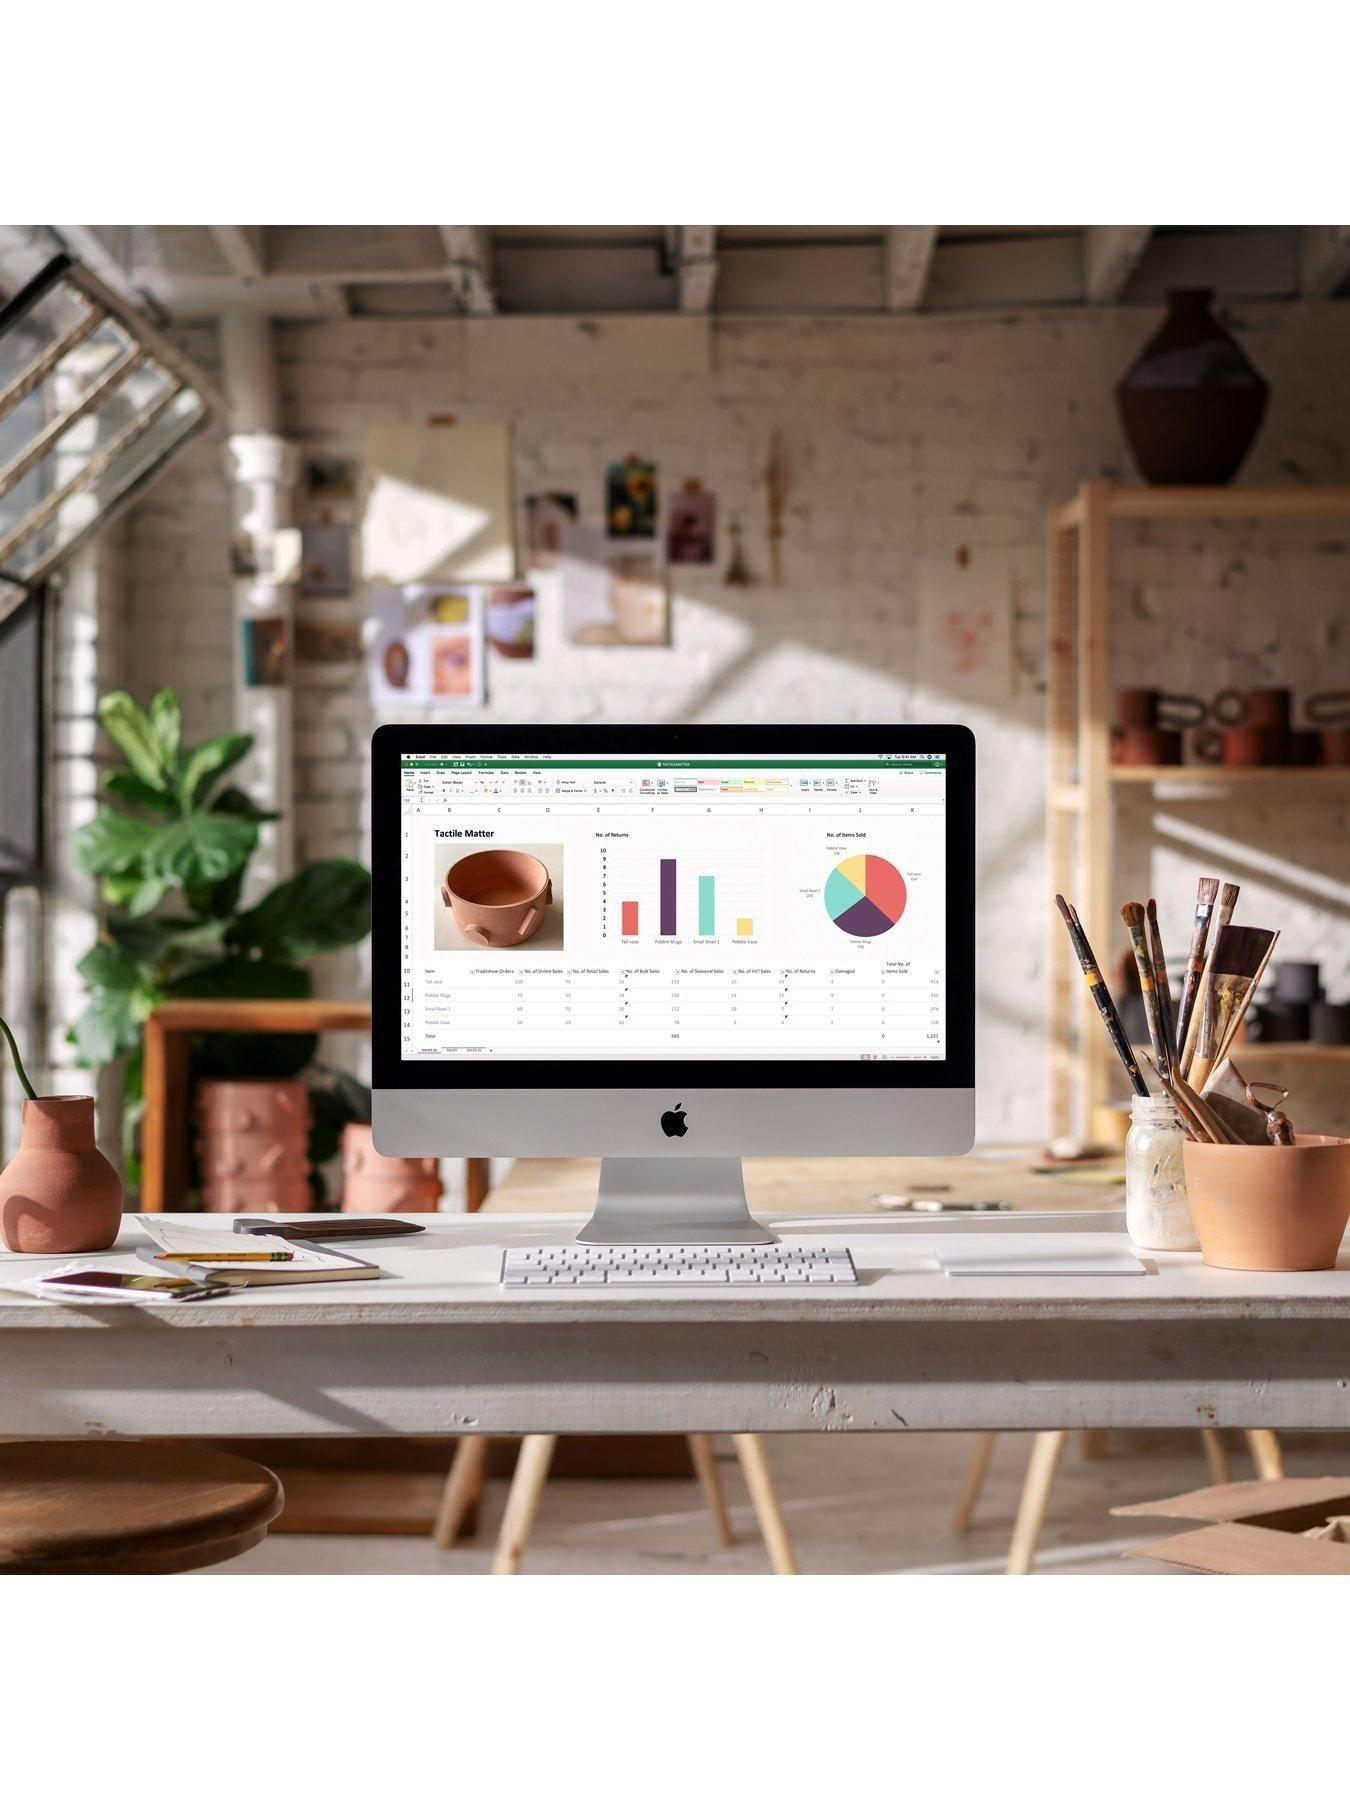 Apple iMac (2019) 27 inch with Retina 5K display, 3.1GHz 6